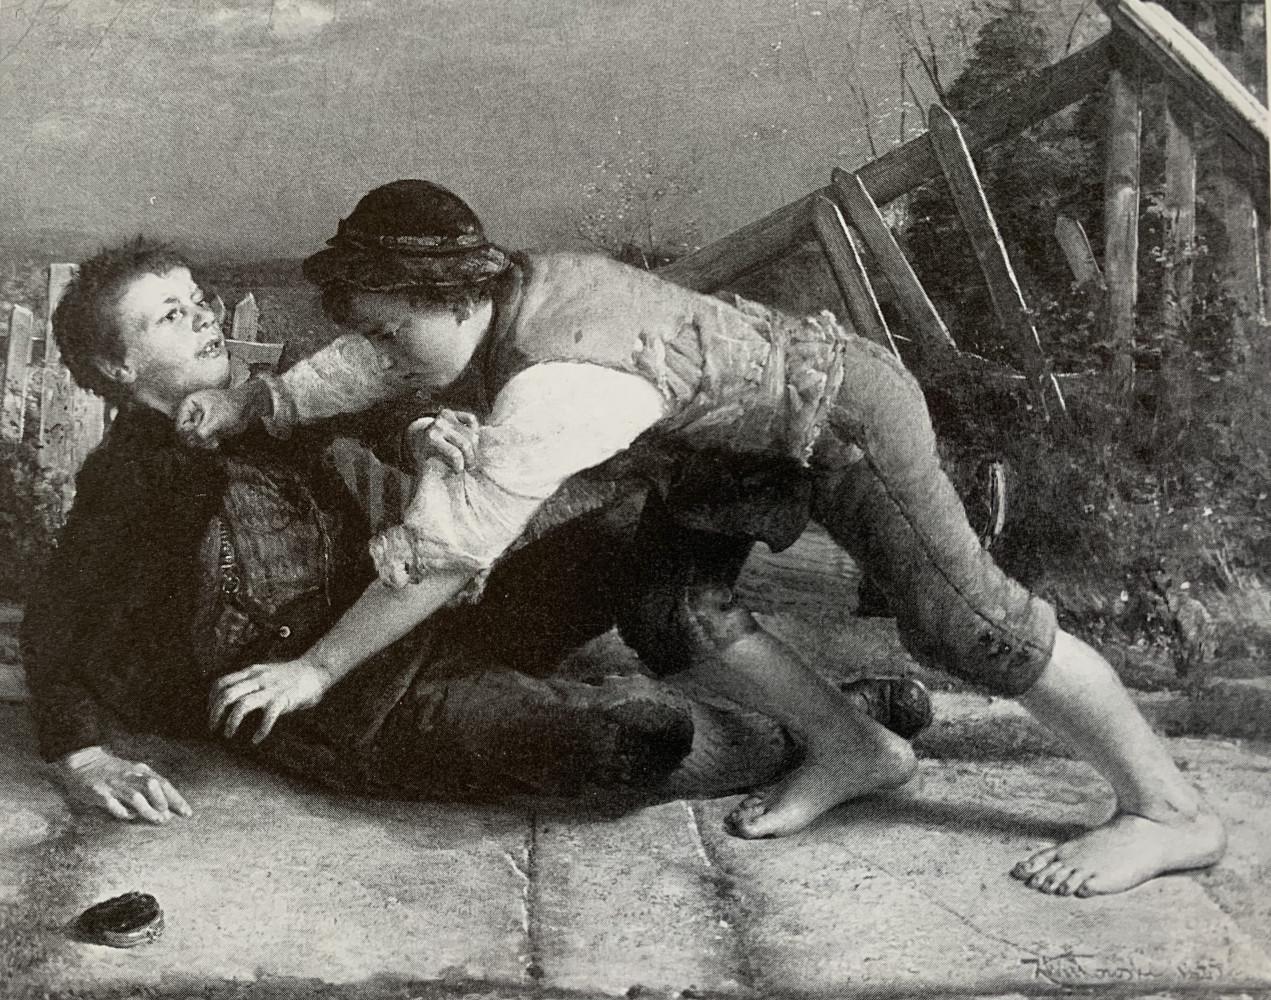 Children Fighting by Karol (Karl) D. Witkowski